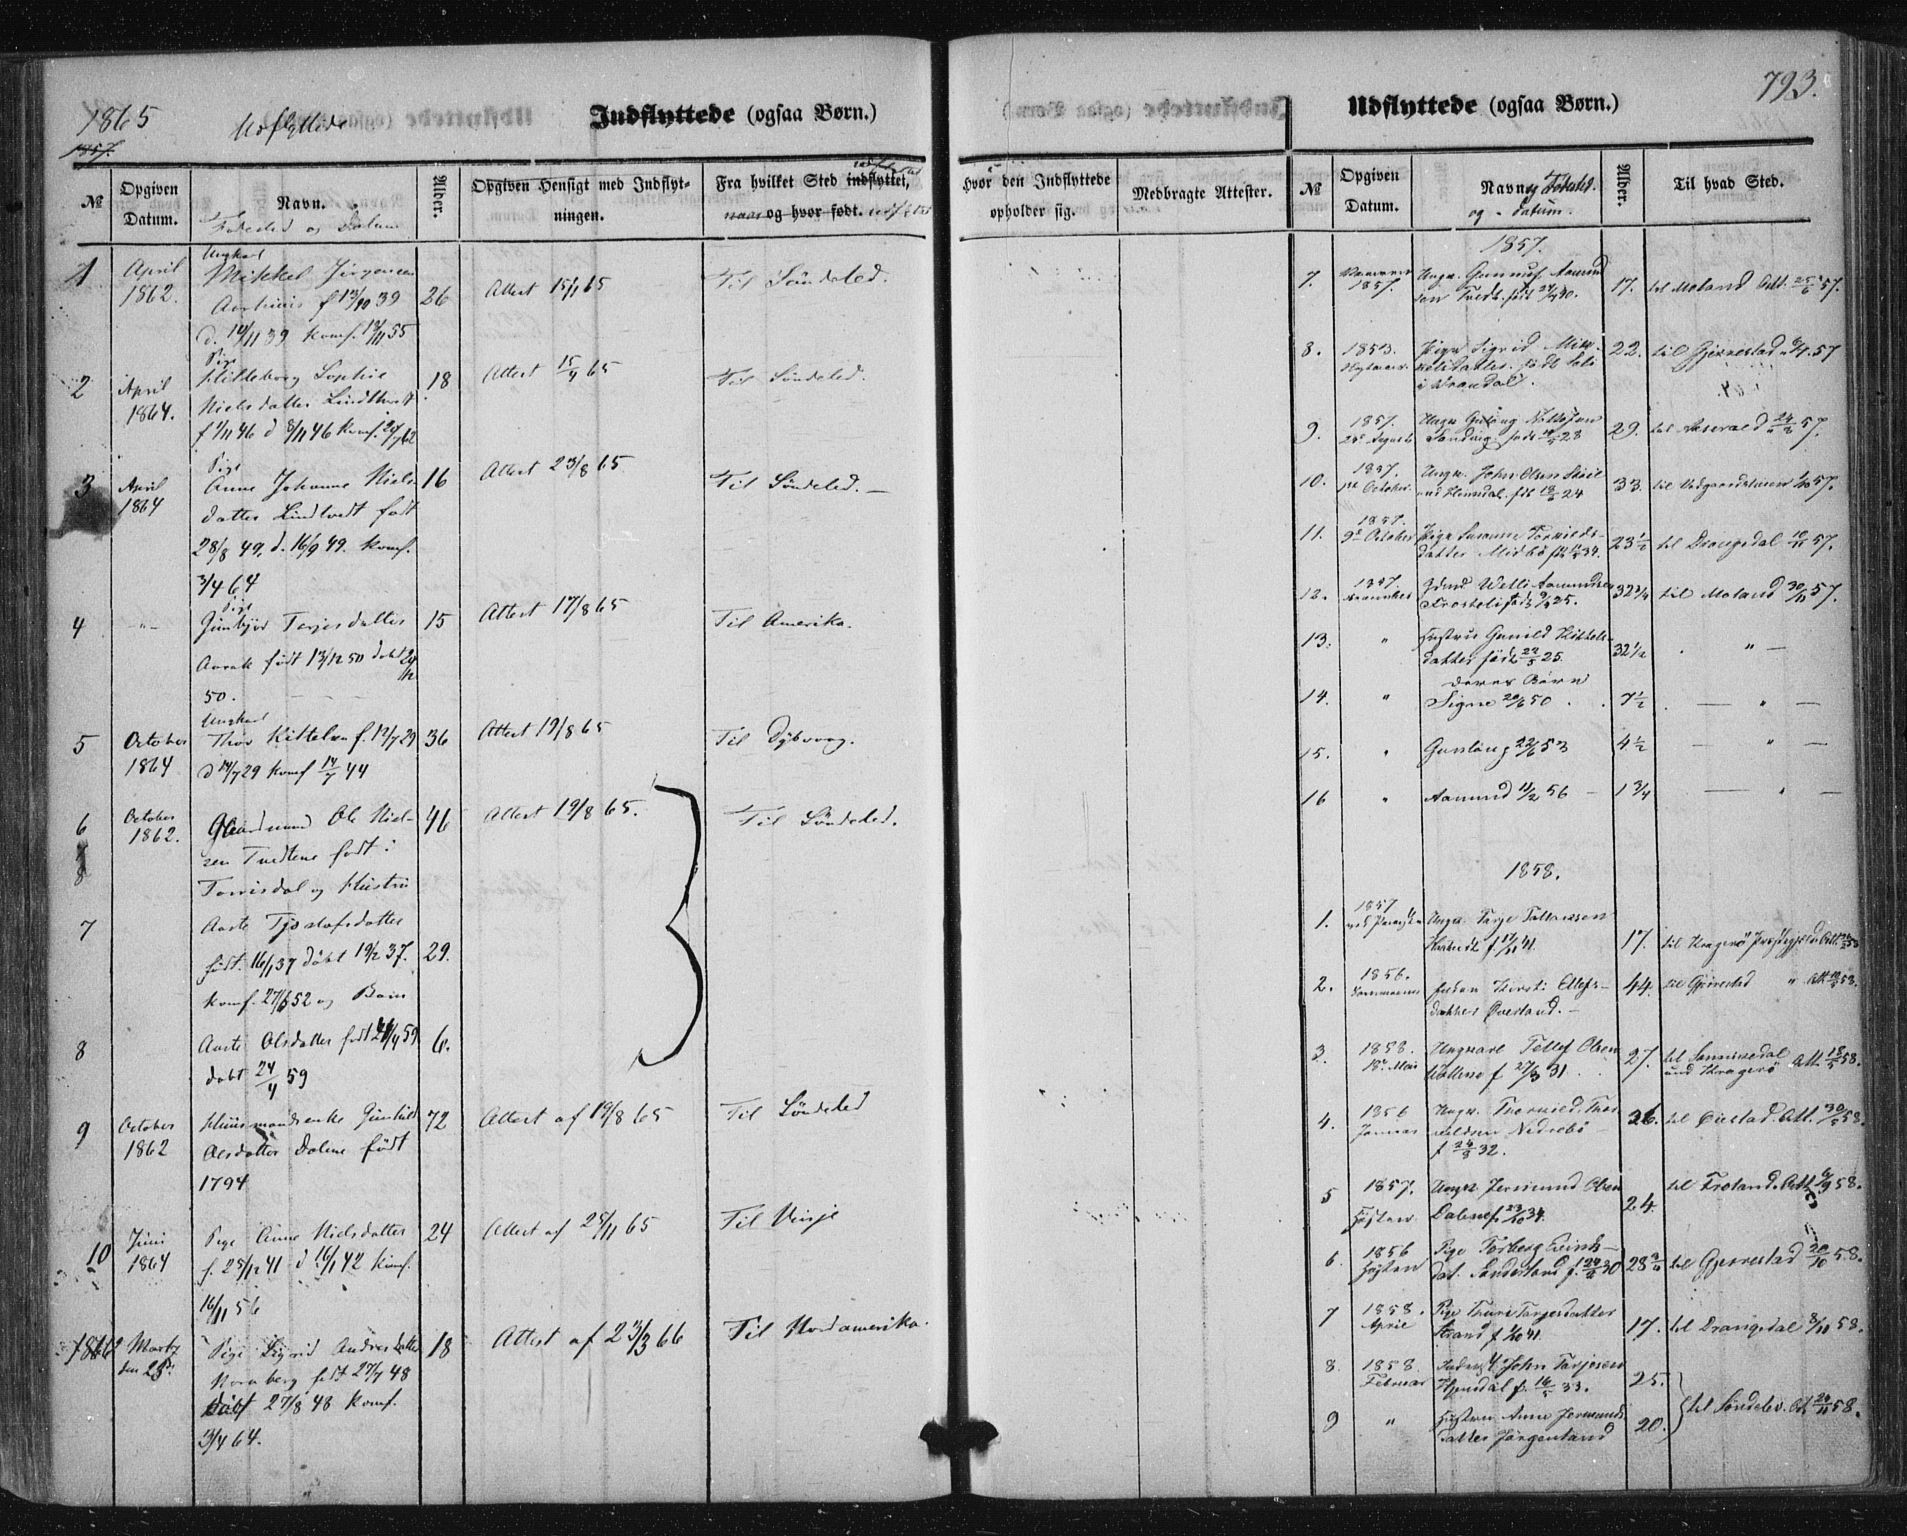 SAKO, Nissedal kirkebøker, F/Fa/L0003: Ministerialbok nr. I 3, 1846-1870, s. 792-793